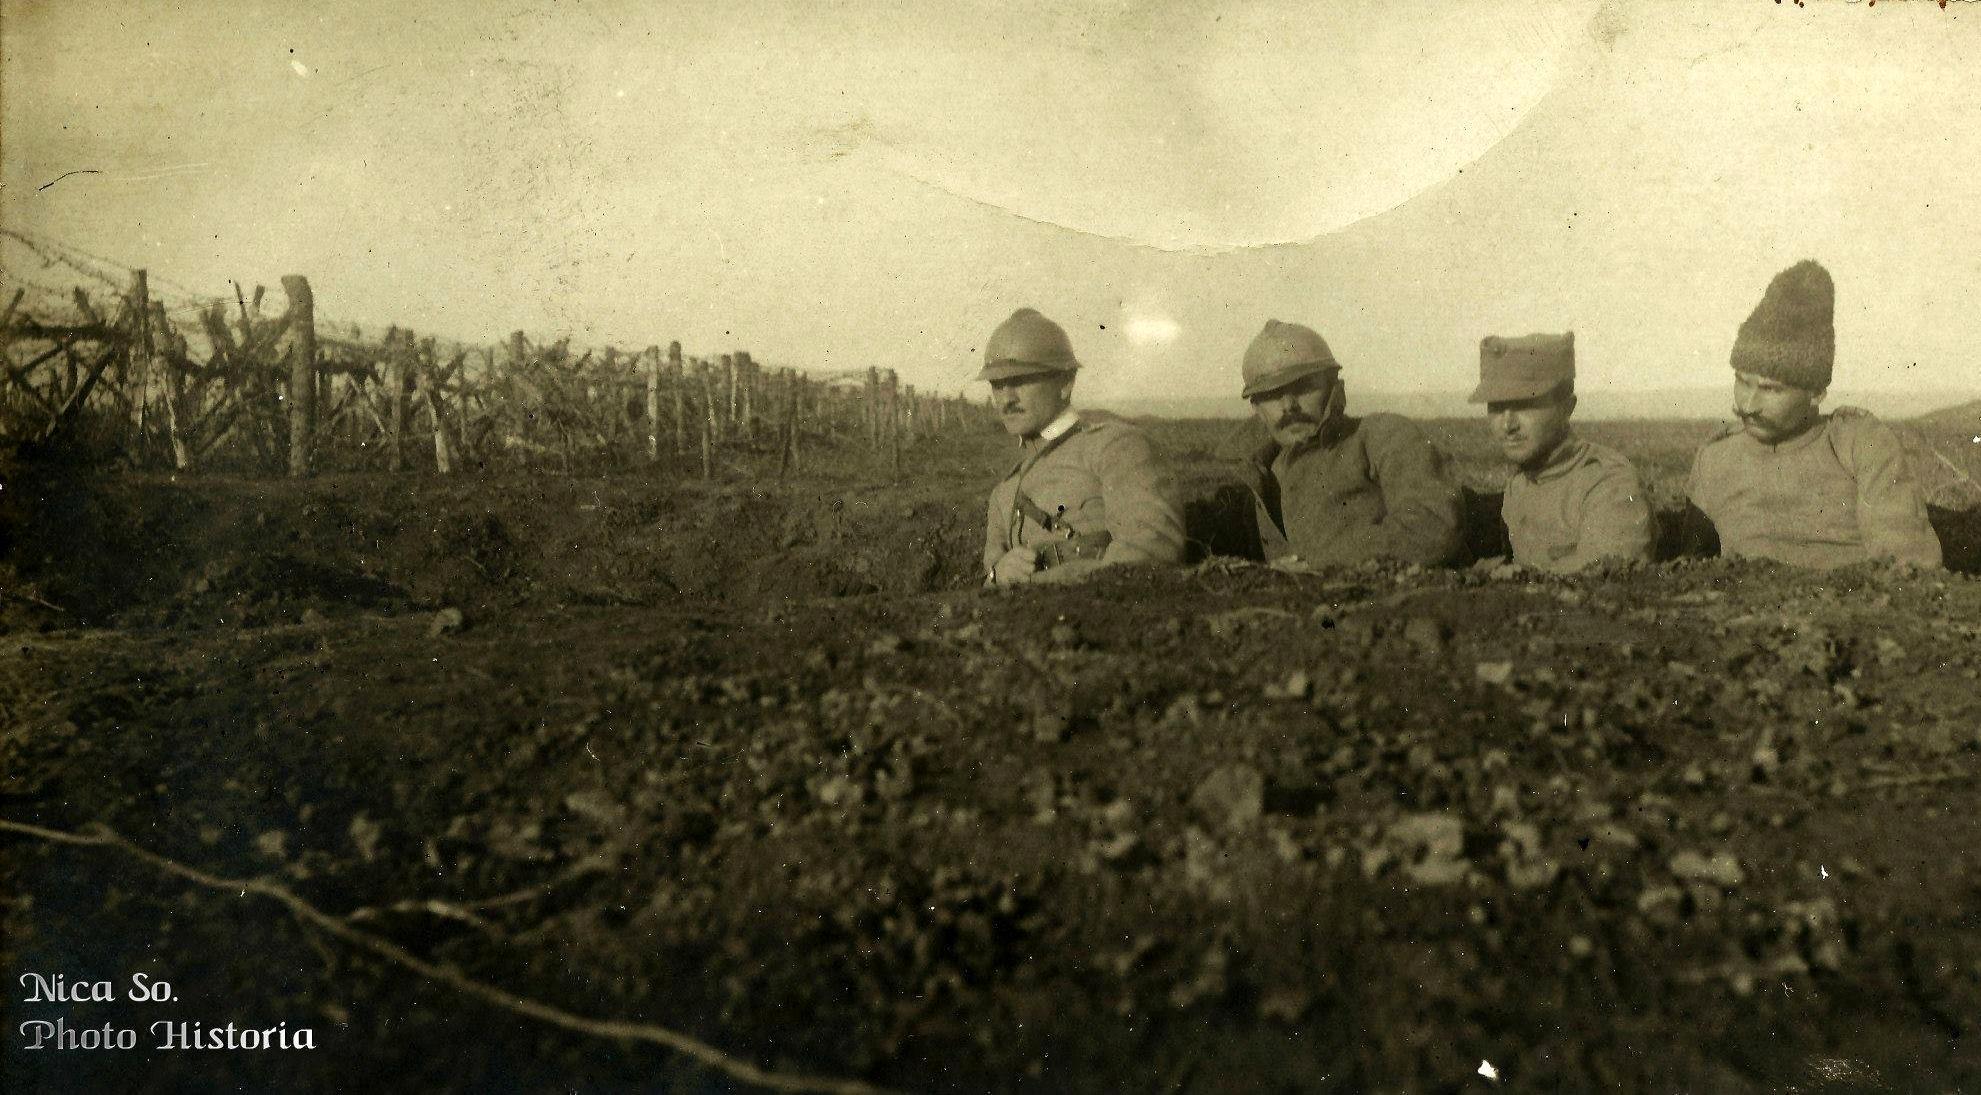 marasti-romanian-army-soldiers-world-war-world-war-1-ww1.jpg